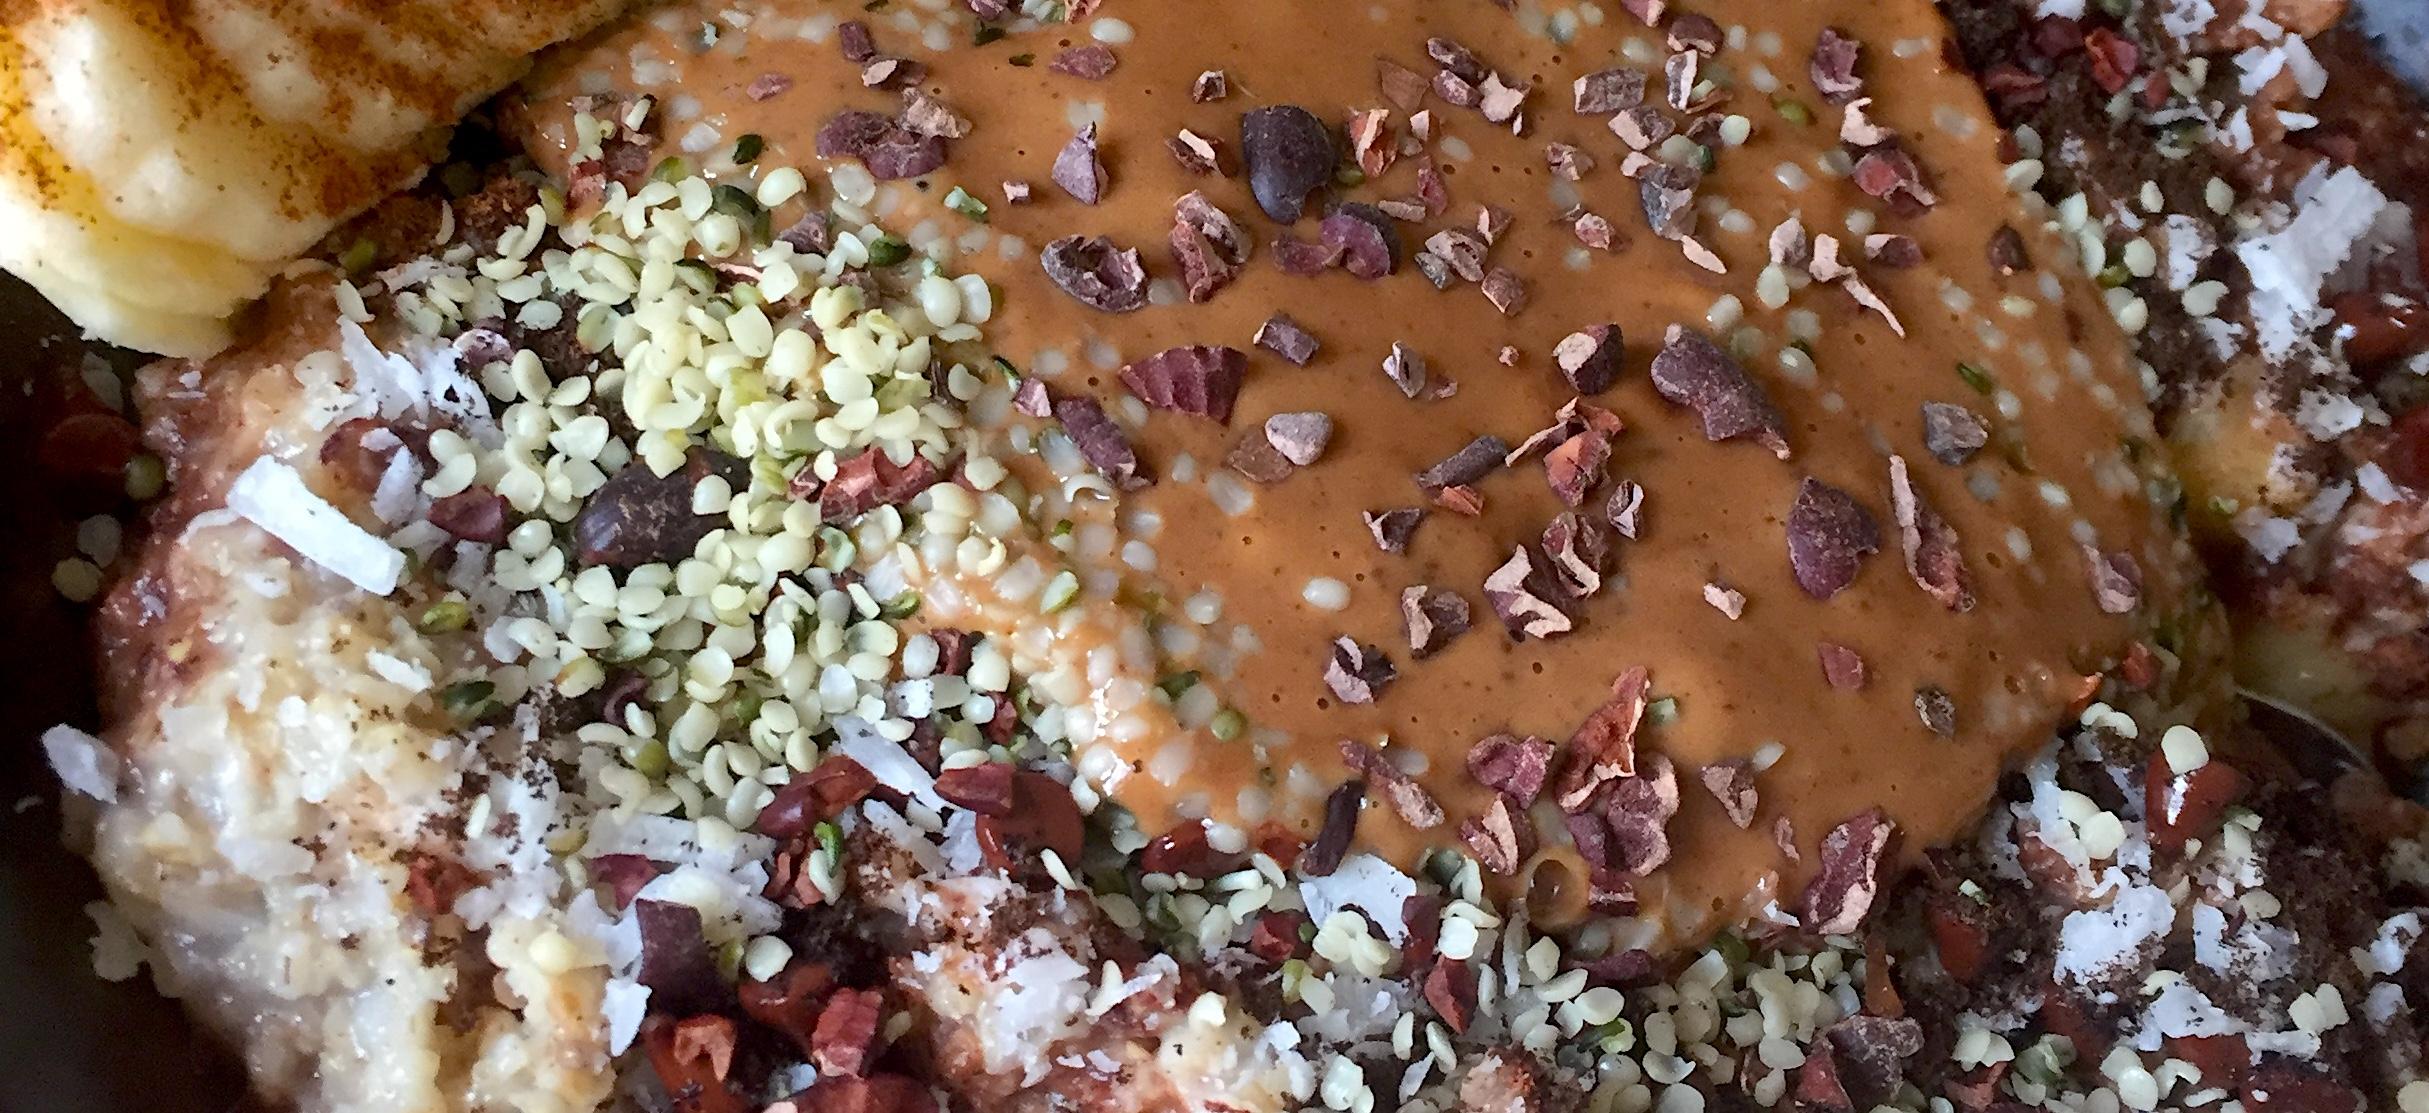 River-Runs-Wild-Oats-Oatmeal-Recipes-Bodybuilding-Fitness-Nutrition-Bulking-Plantbased-Vegetarian-Vegan-Protein-Grow-Bulk-Eat-Blog-German-Chocolate-Cake-Coconut